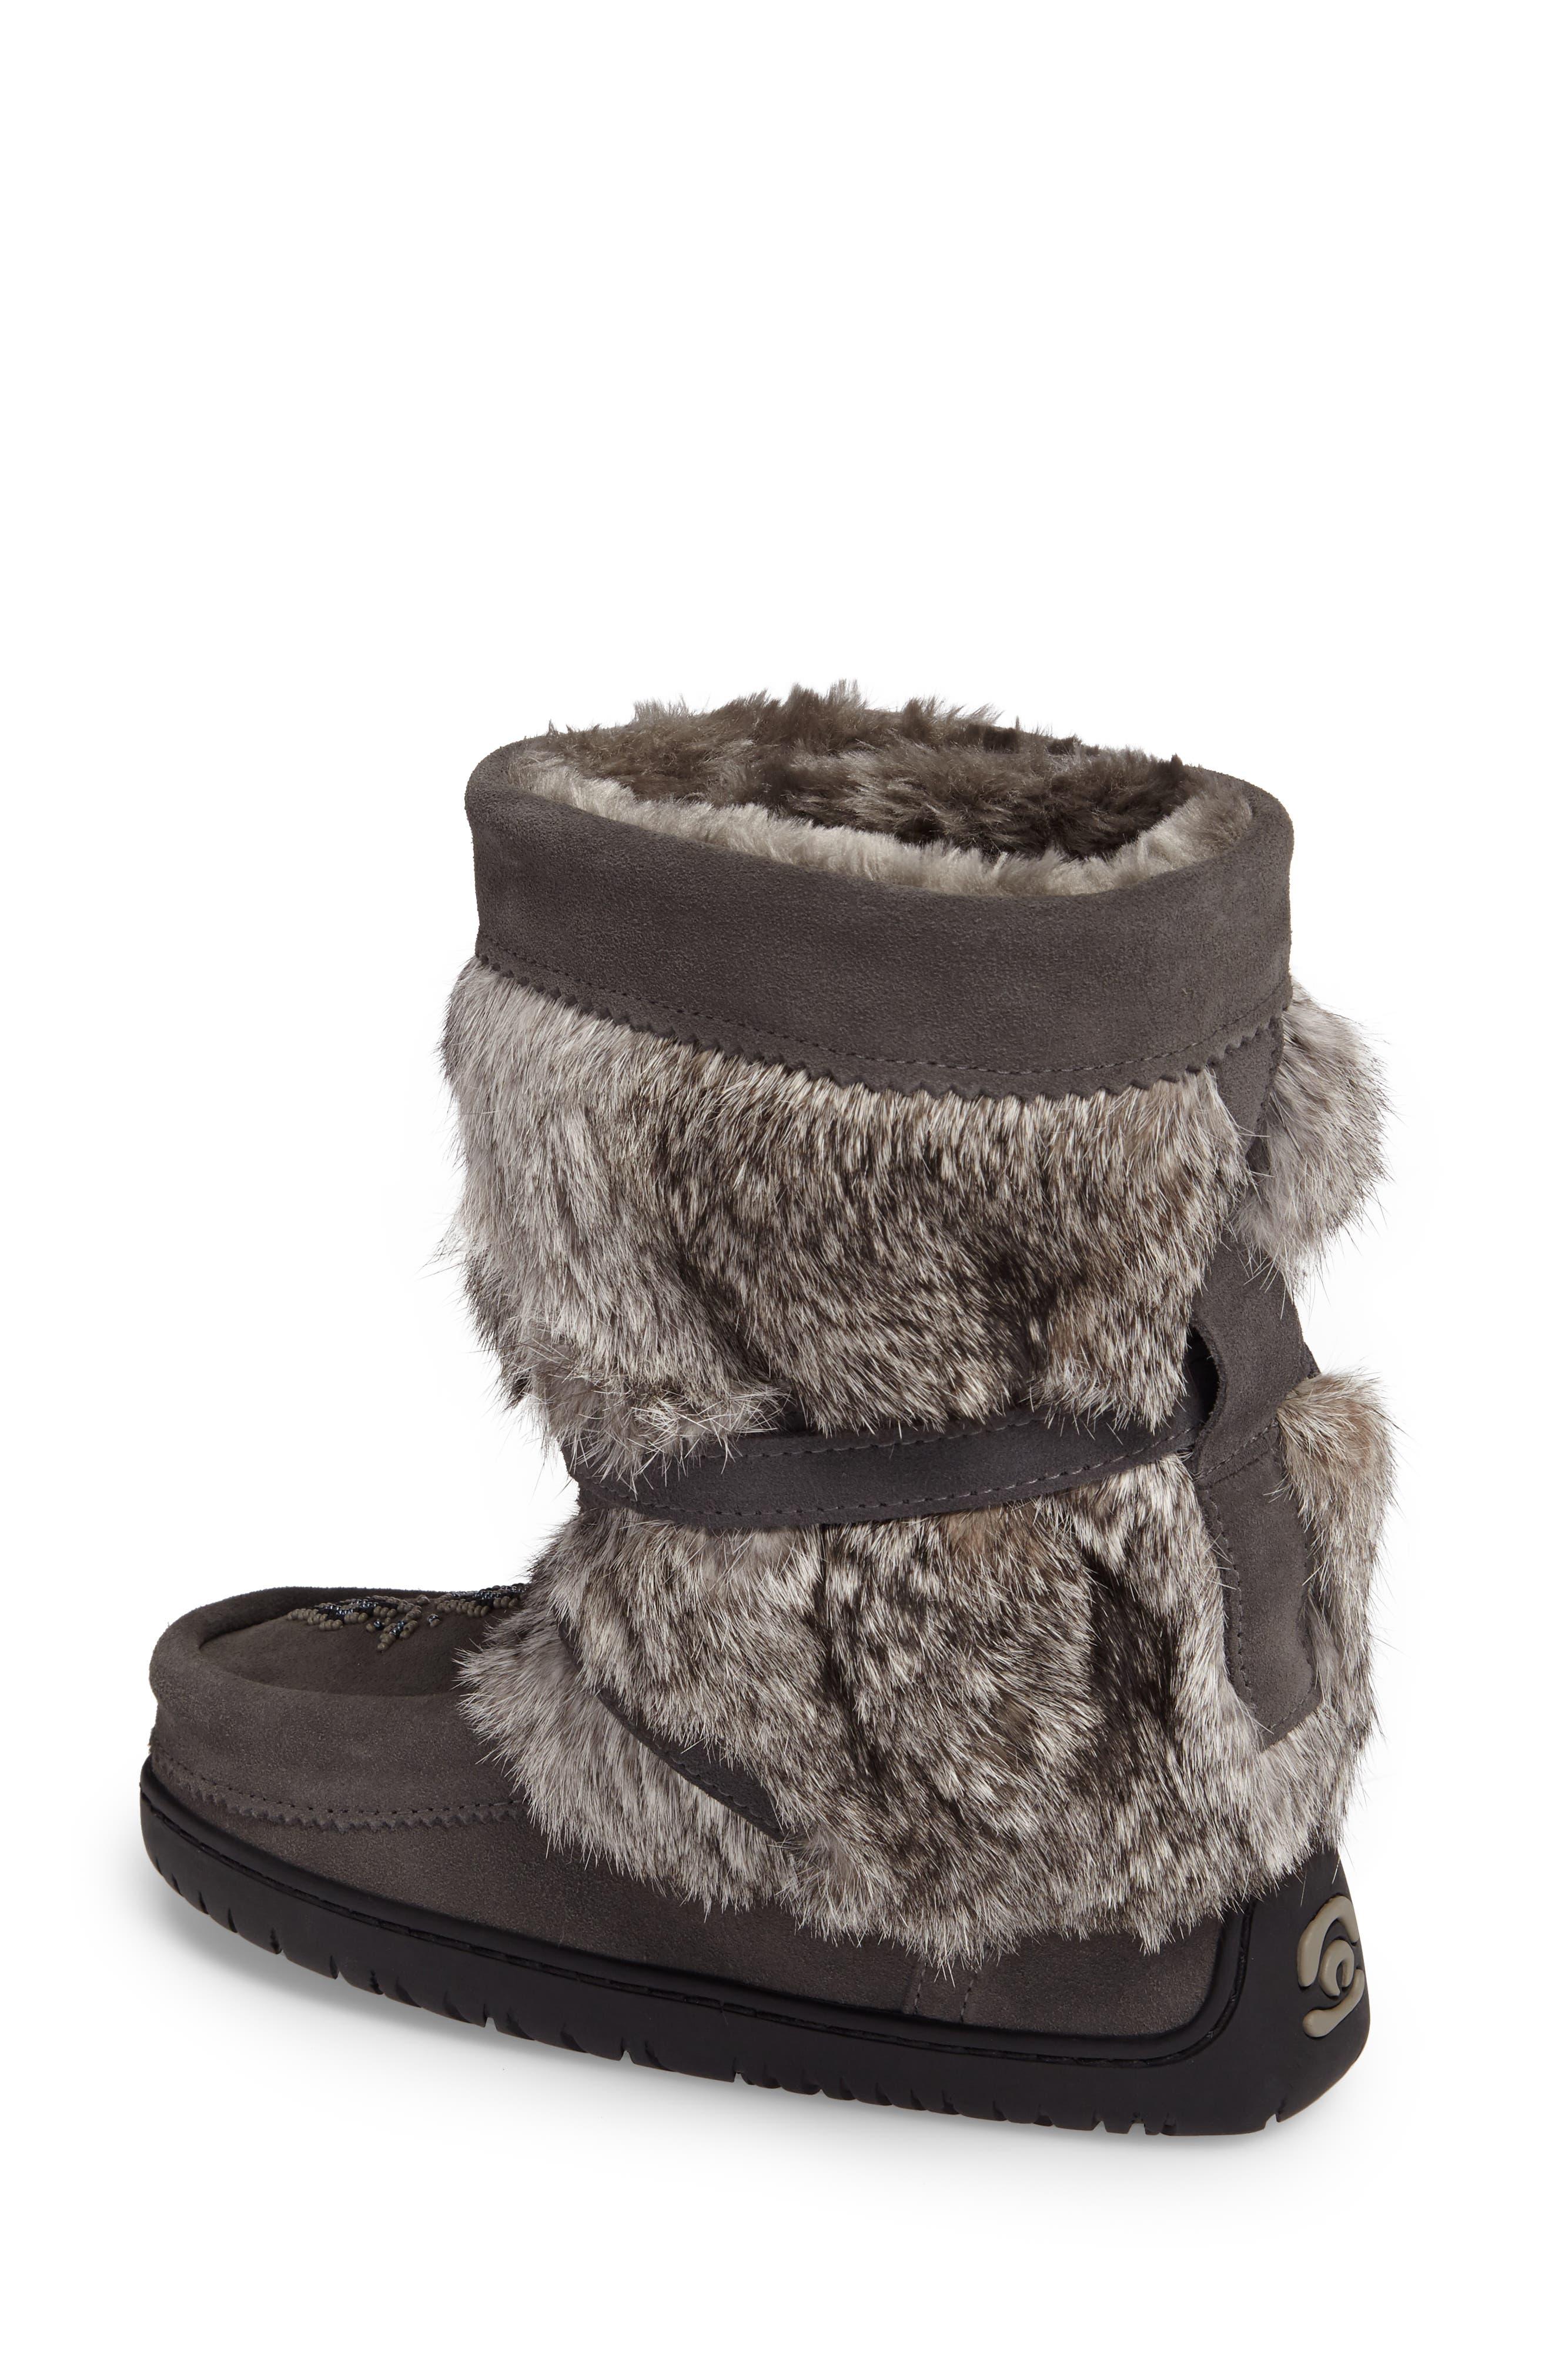 Beaded Short Wrap Genuine Rabbit Fur & Shearling Boot,                             Alternate thumbnail 2, color,                             CHARCOAL FUR